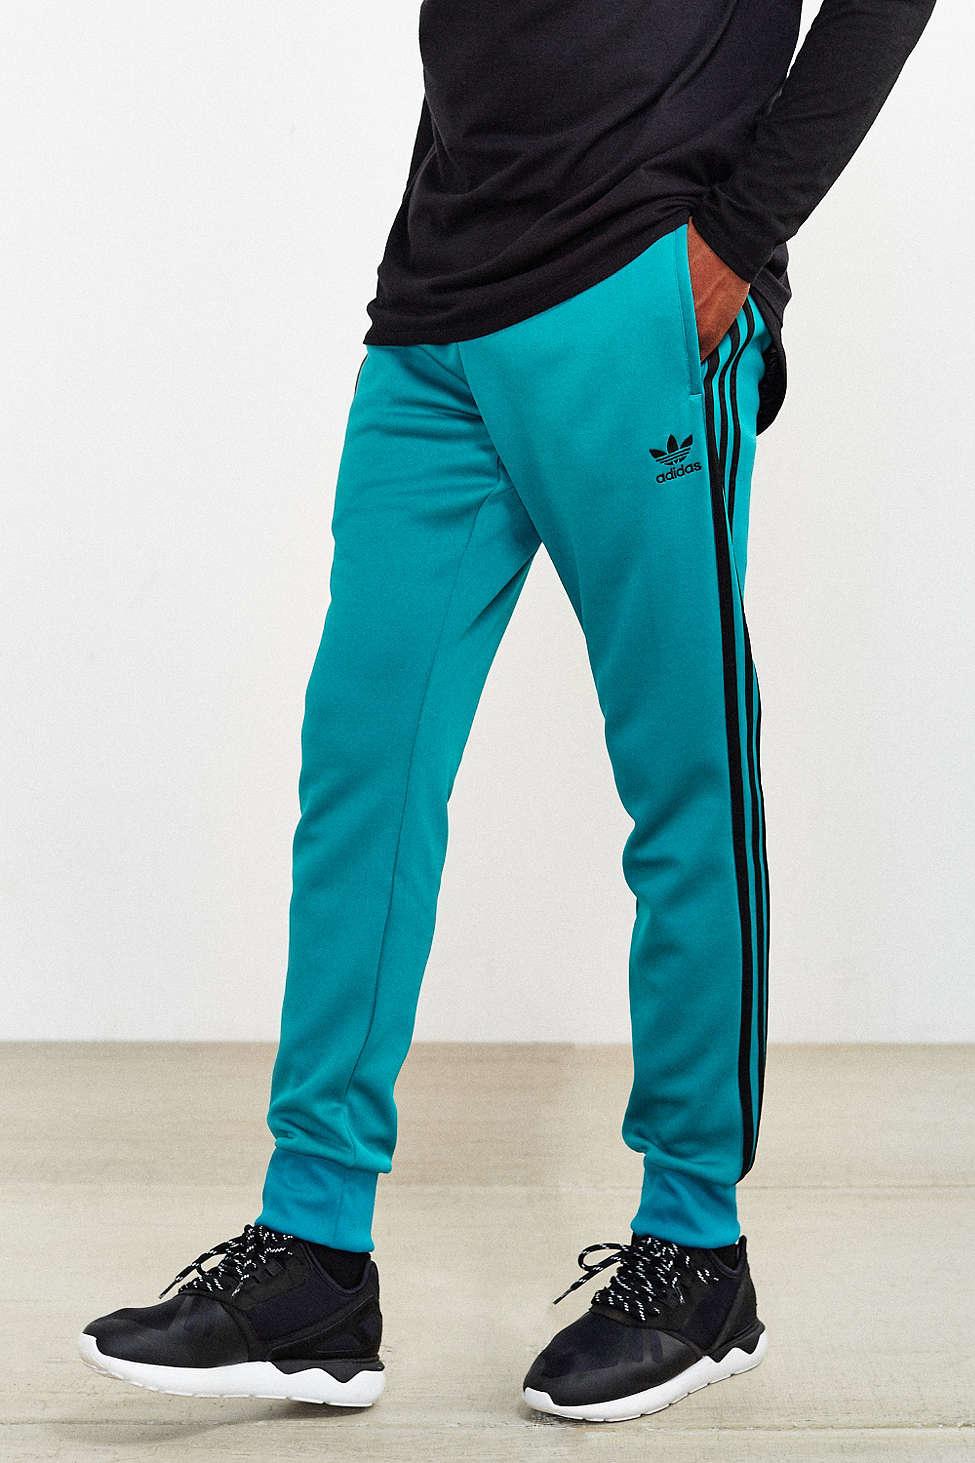 lyst adidas superstar - traccia le originali originali in blu